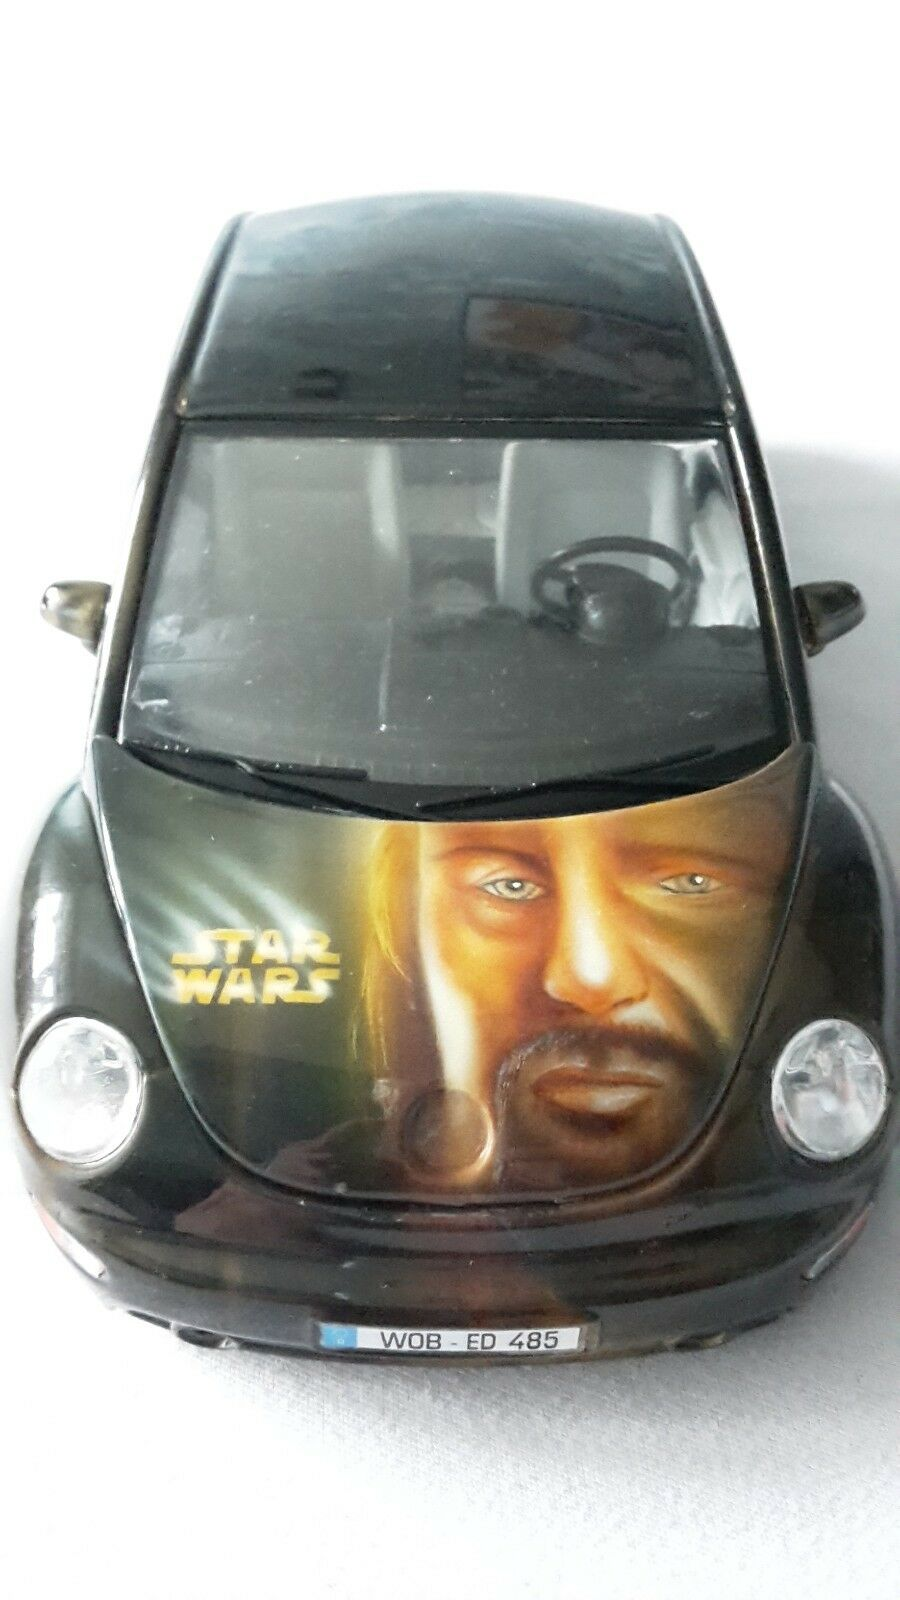 New Beetle   Star Wars   Airbrush   Bburago 1 18